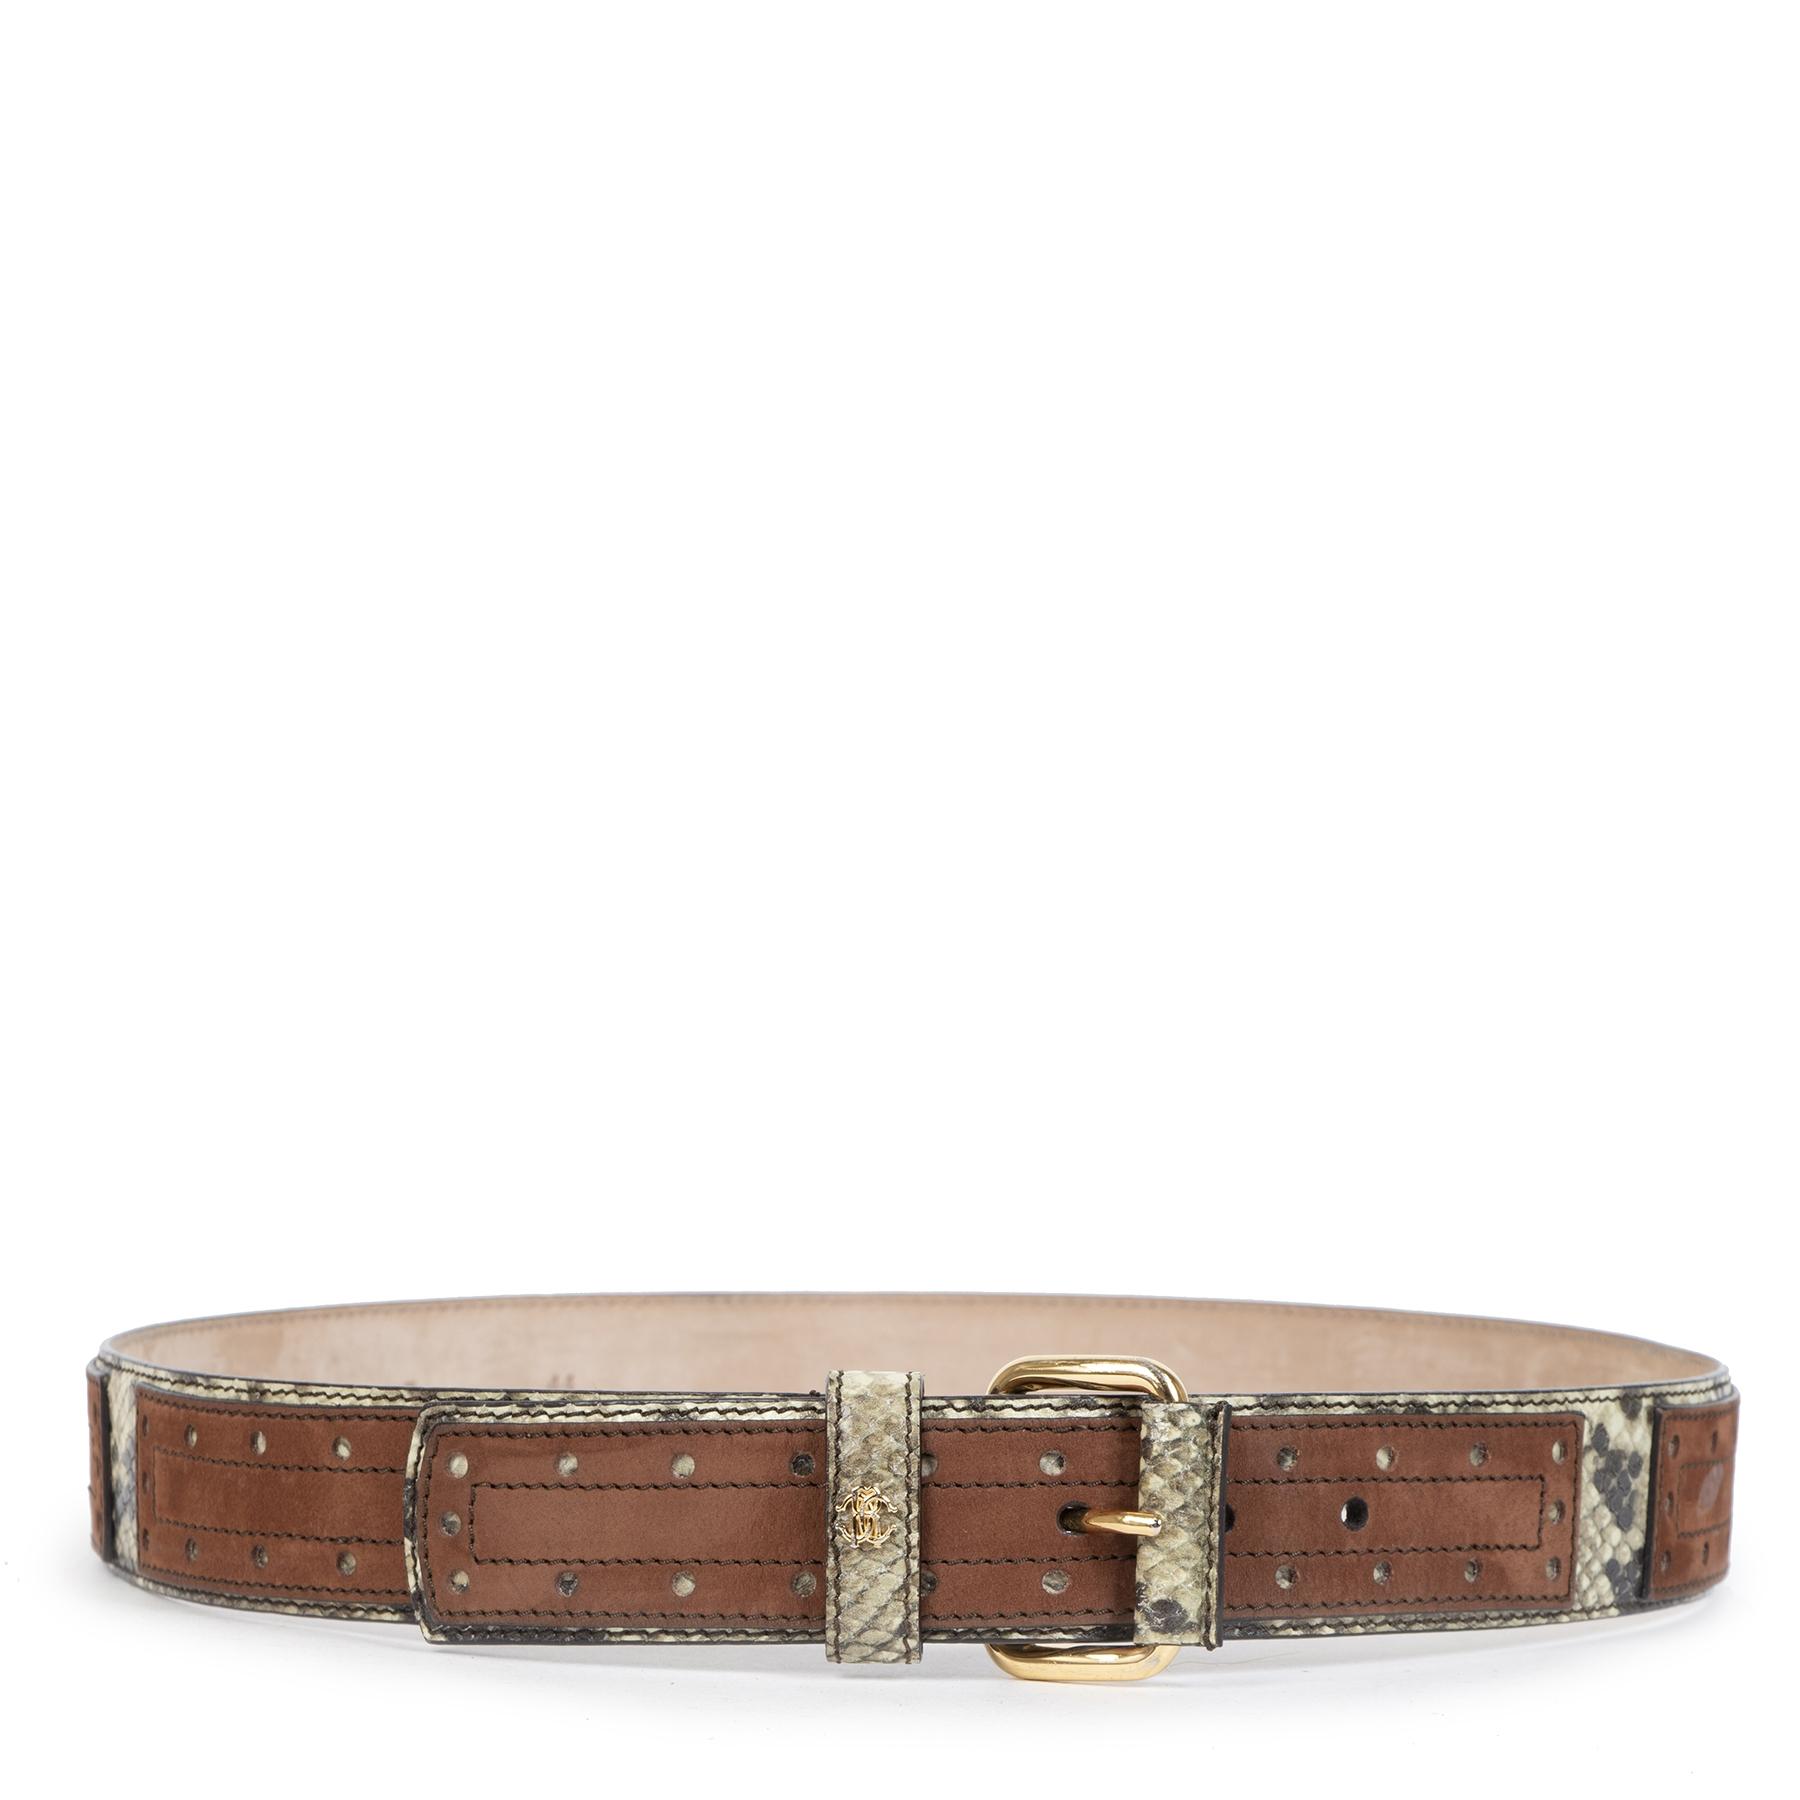 Authentieke tweedehands vintage Roberto Cavalli Python Belt - Size 90 koop online webshop LabelLOV